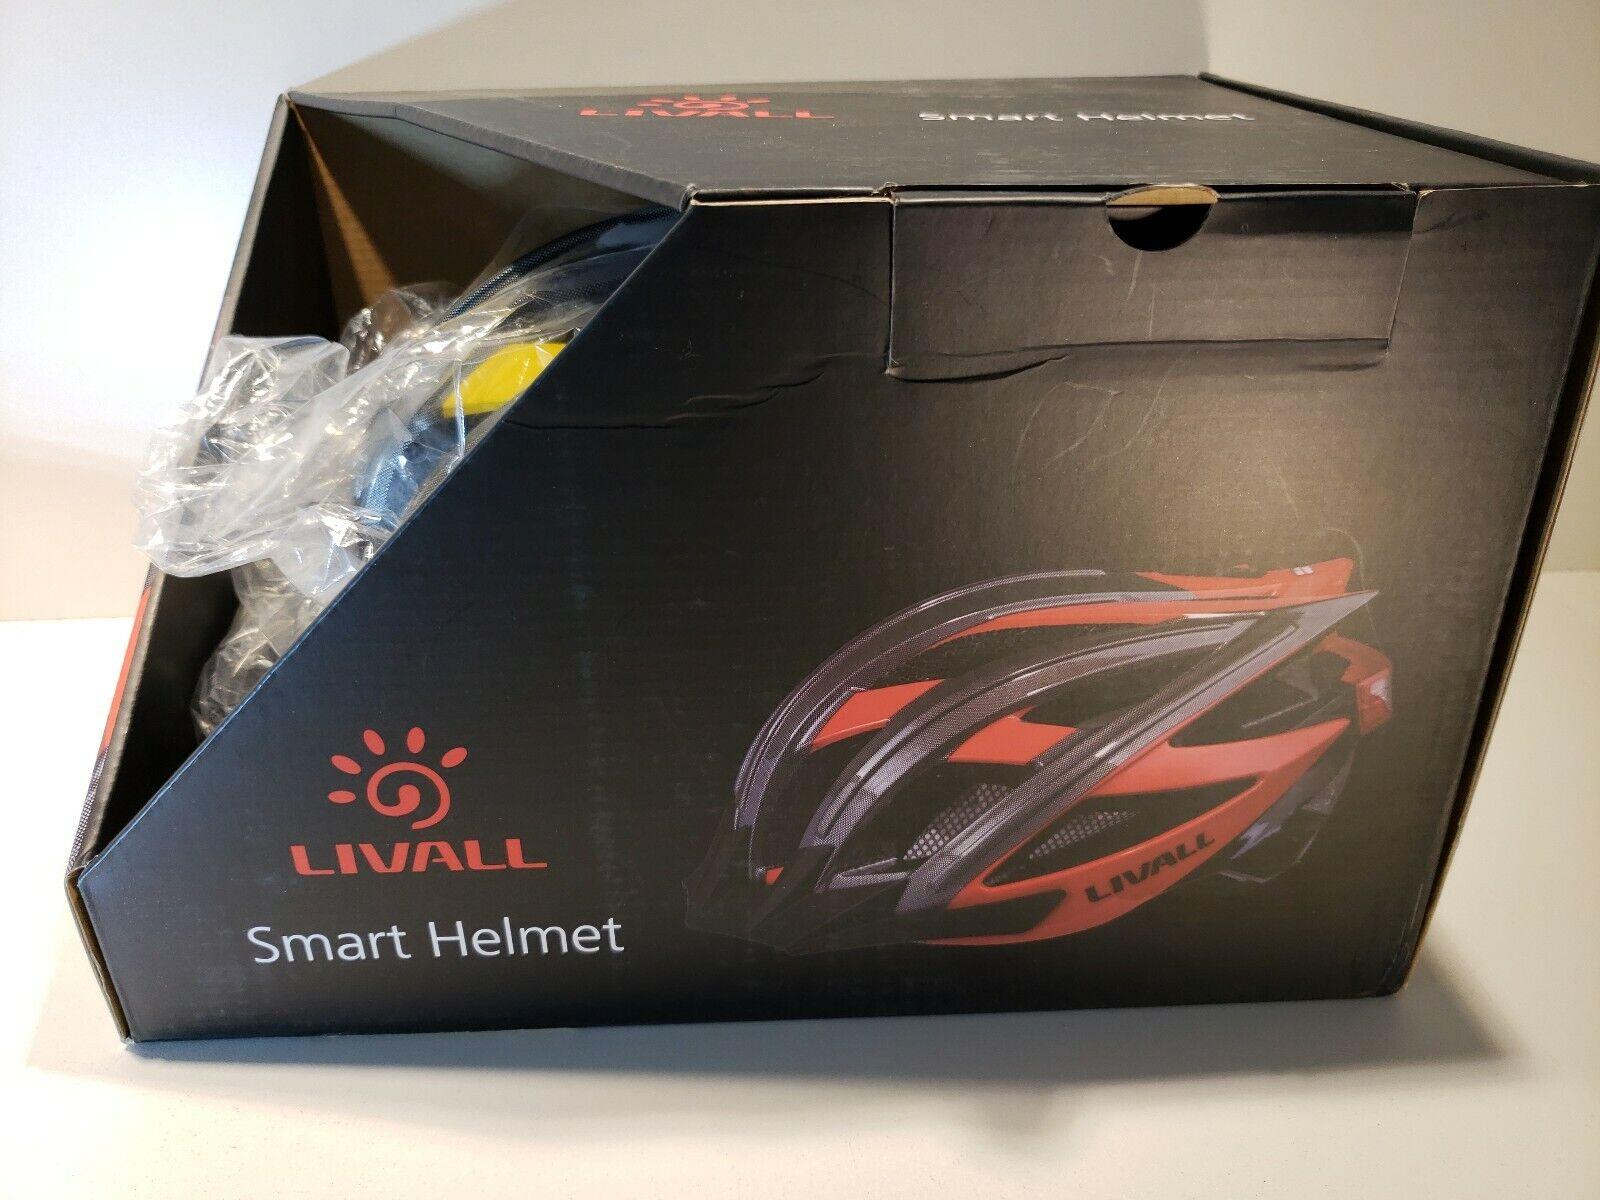 LIVALL BH100 USB Smart Helmet with Speakers